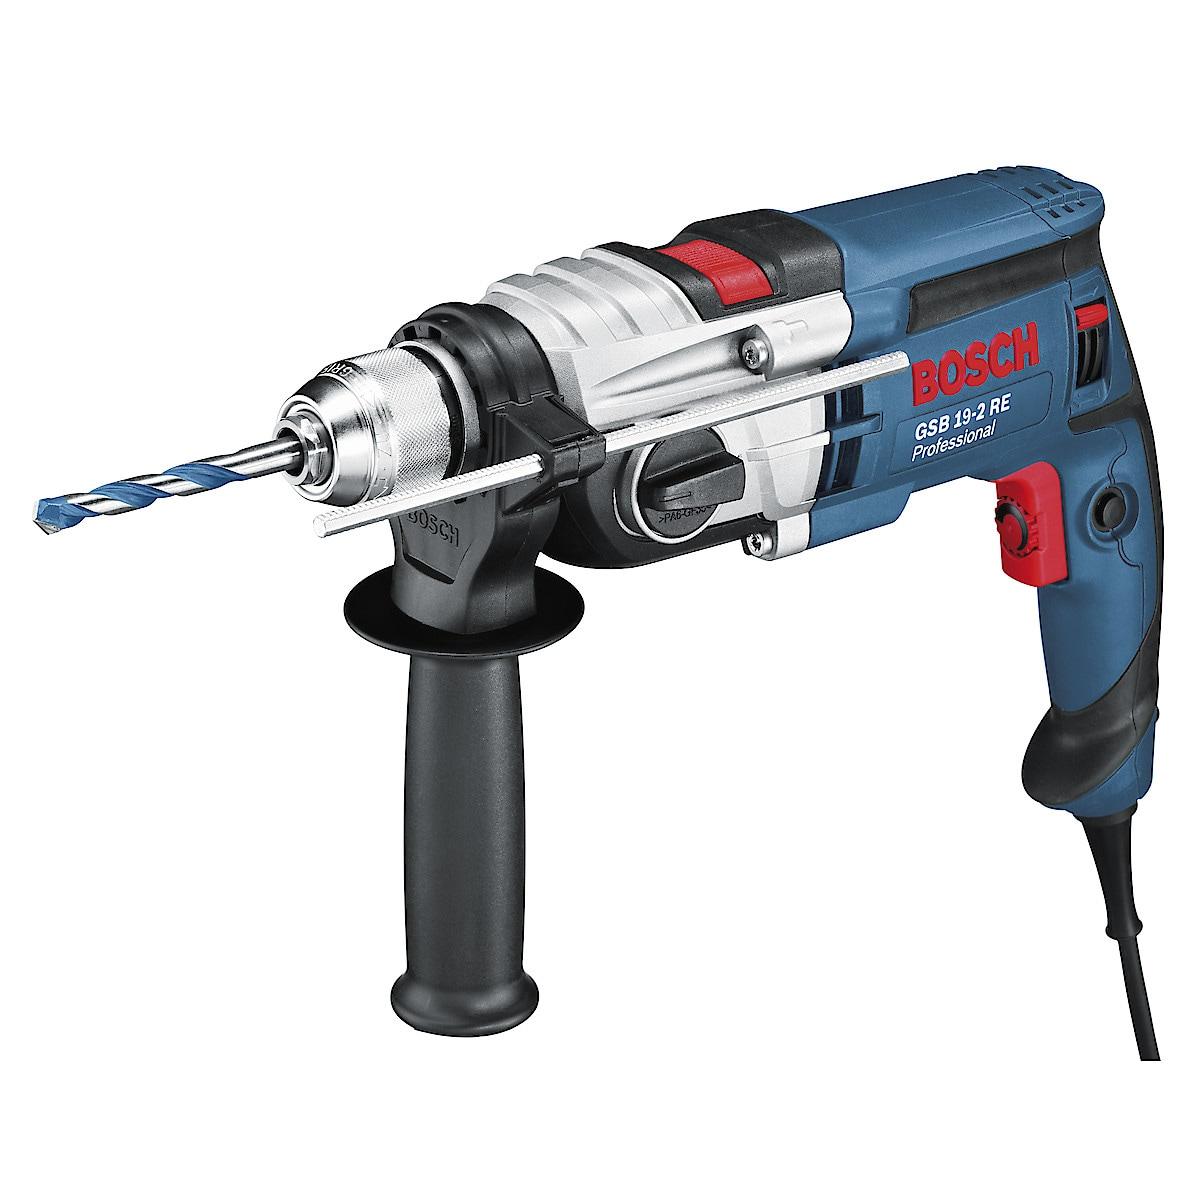 Bosch Professional GSB 19-2  RE slagbormaskin